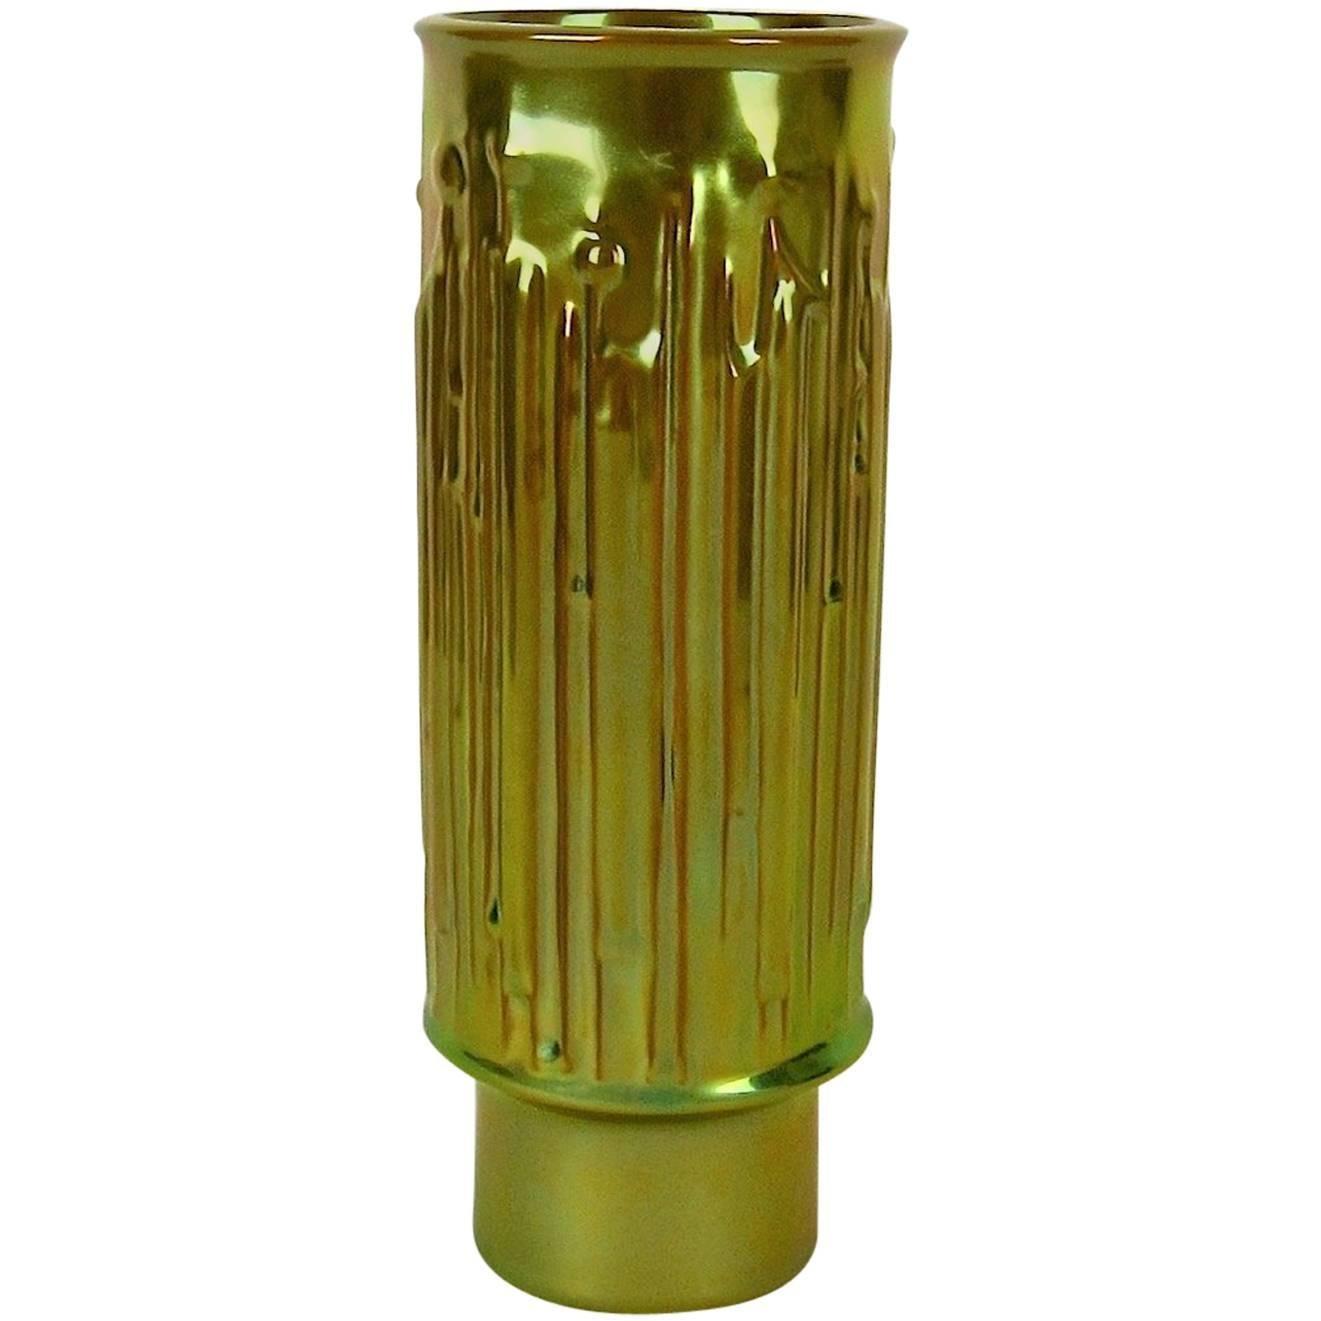 Modernist Zsolnay Pecs Vase with Metallic Eosin Glaze